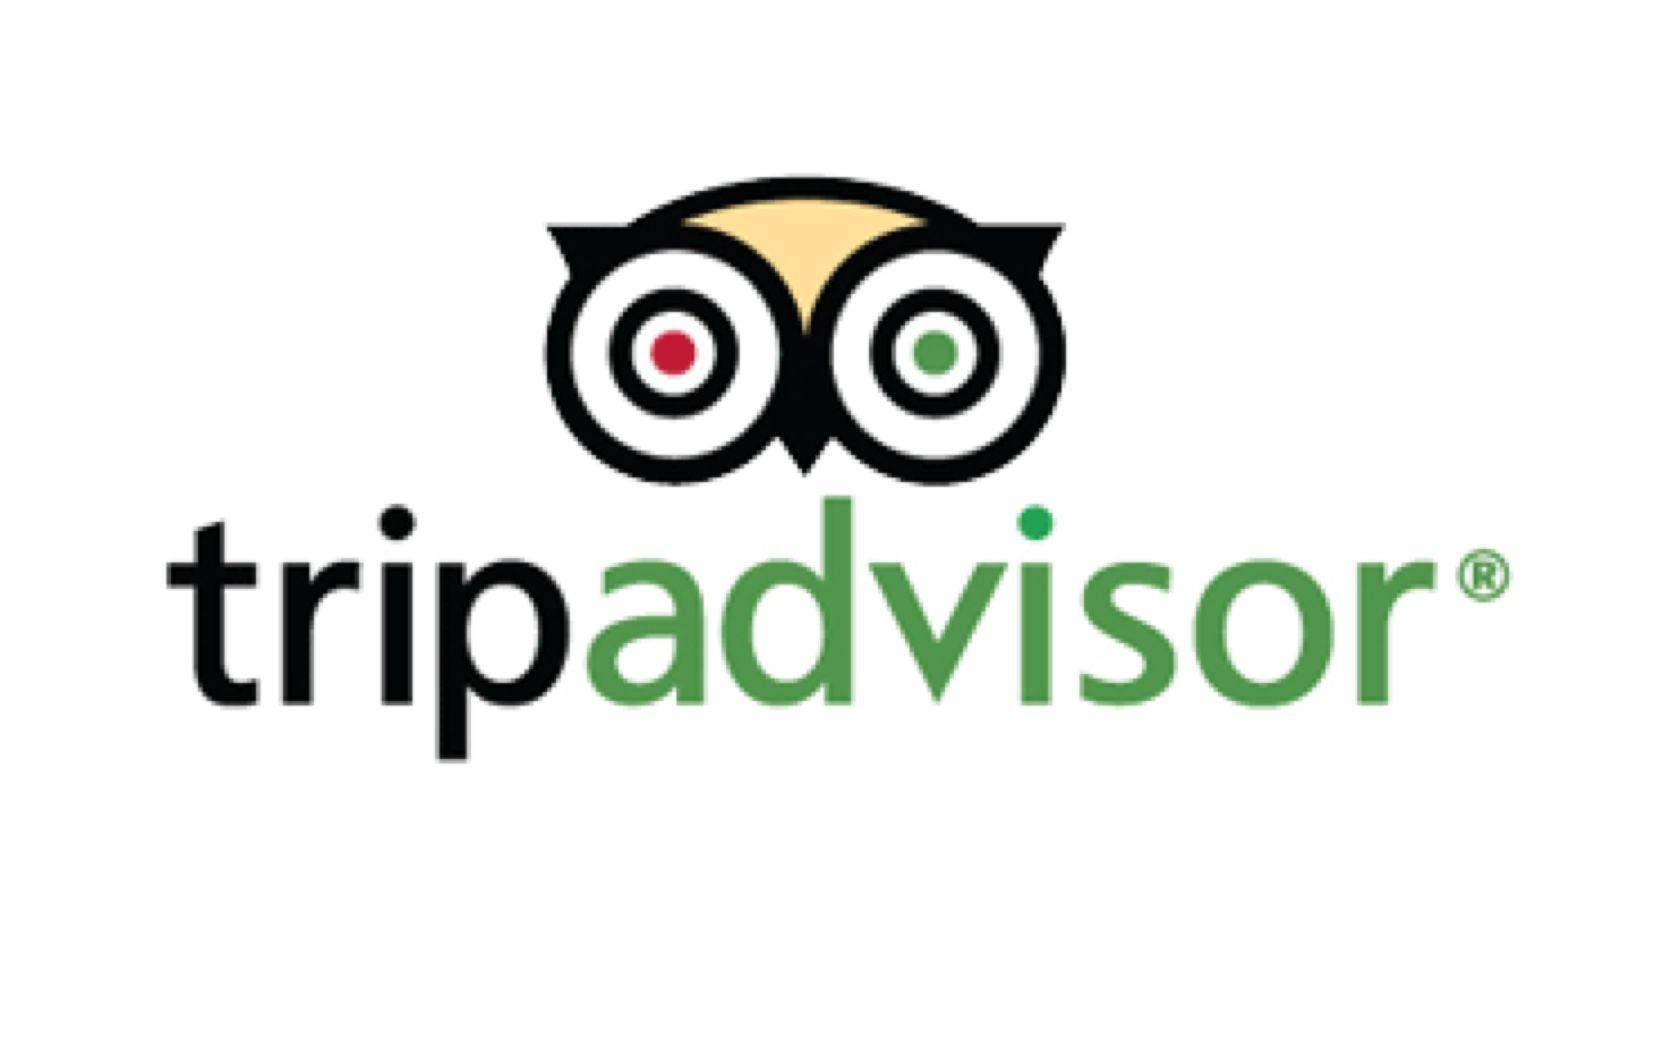 Tripadvisor-logo-vector-download - Tripadvisor Logo Vector PNG